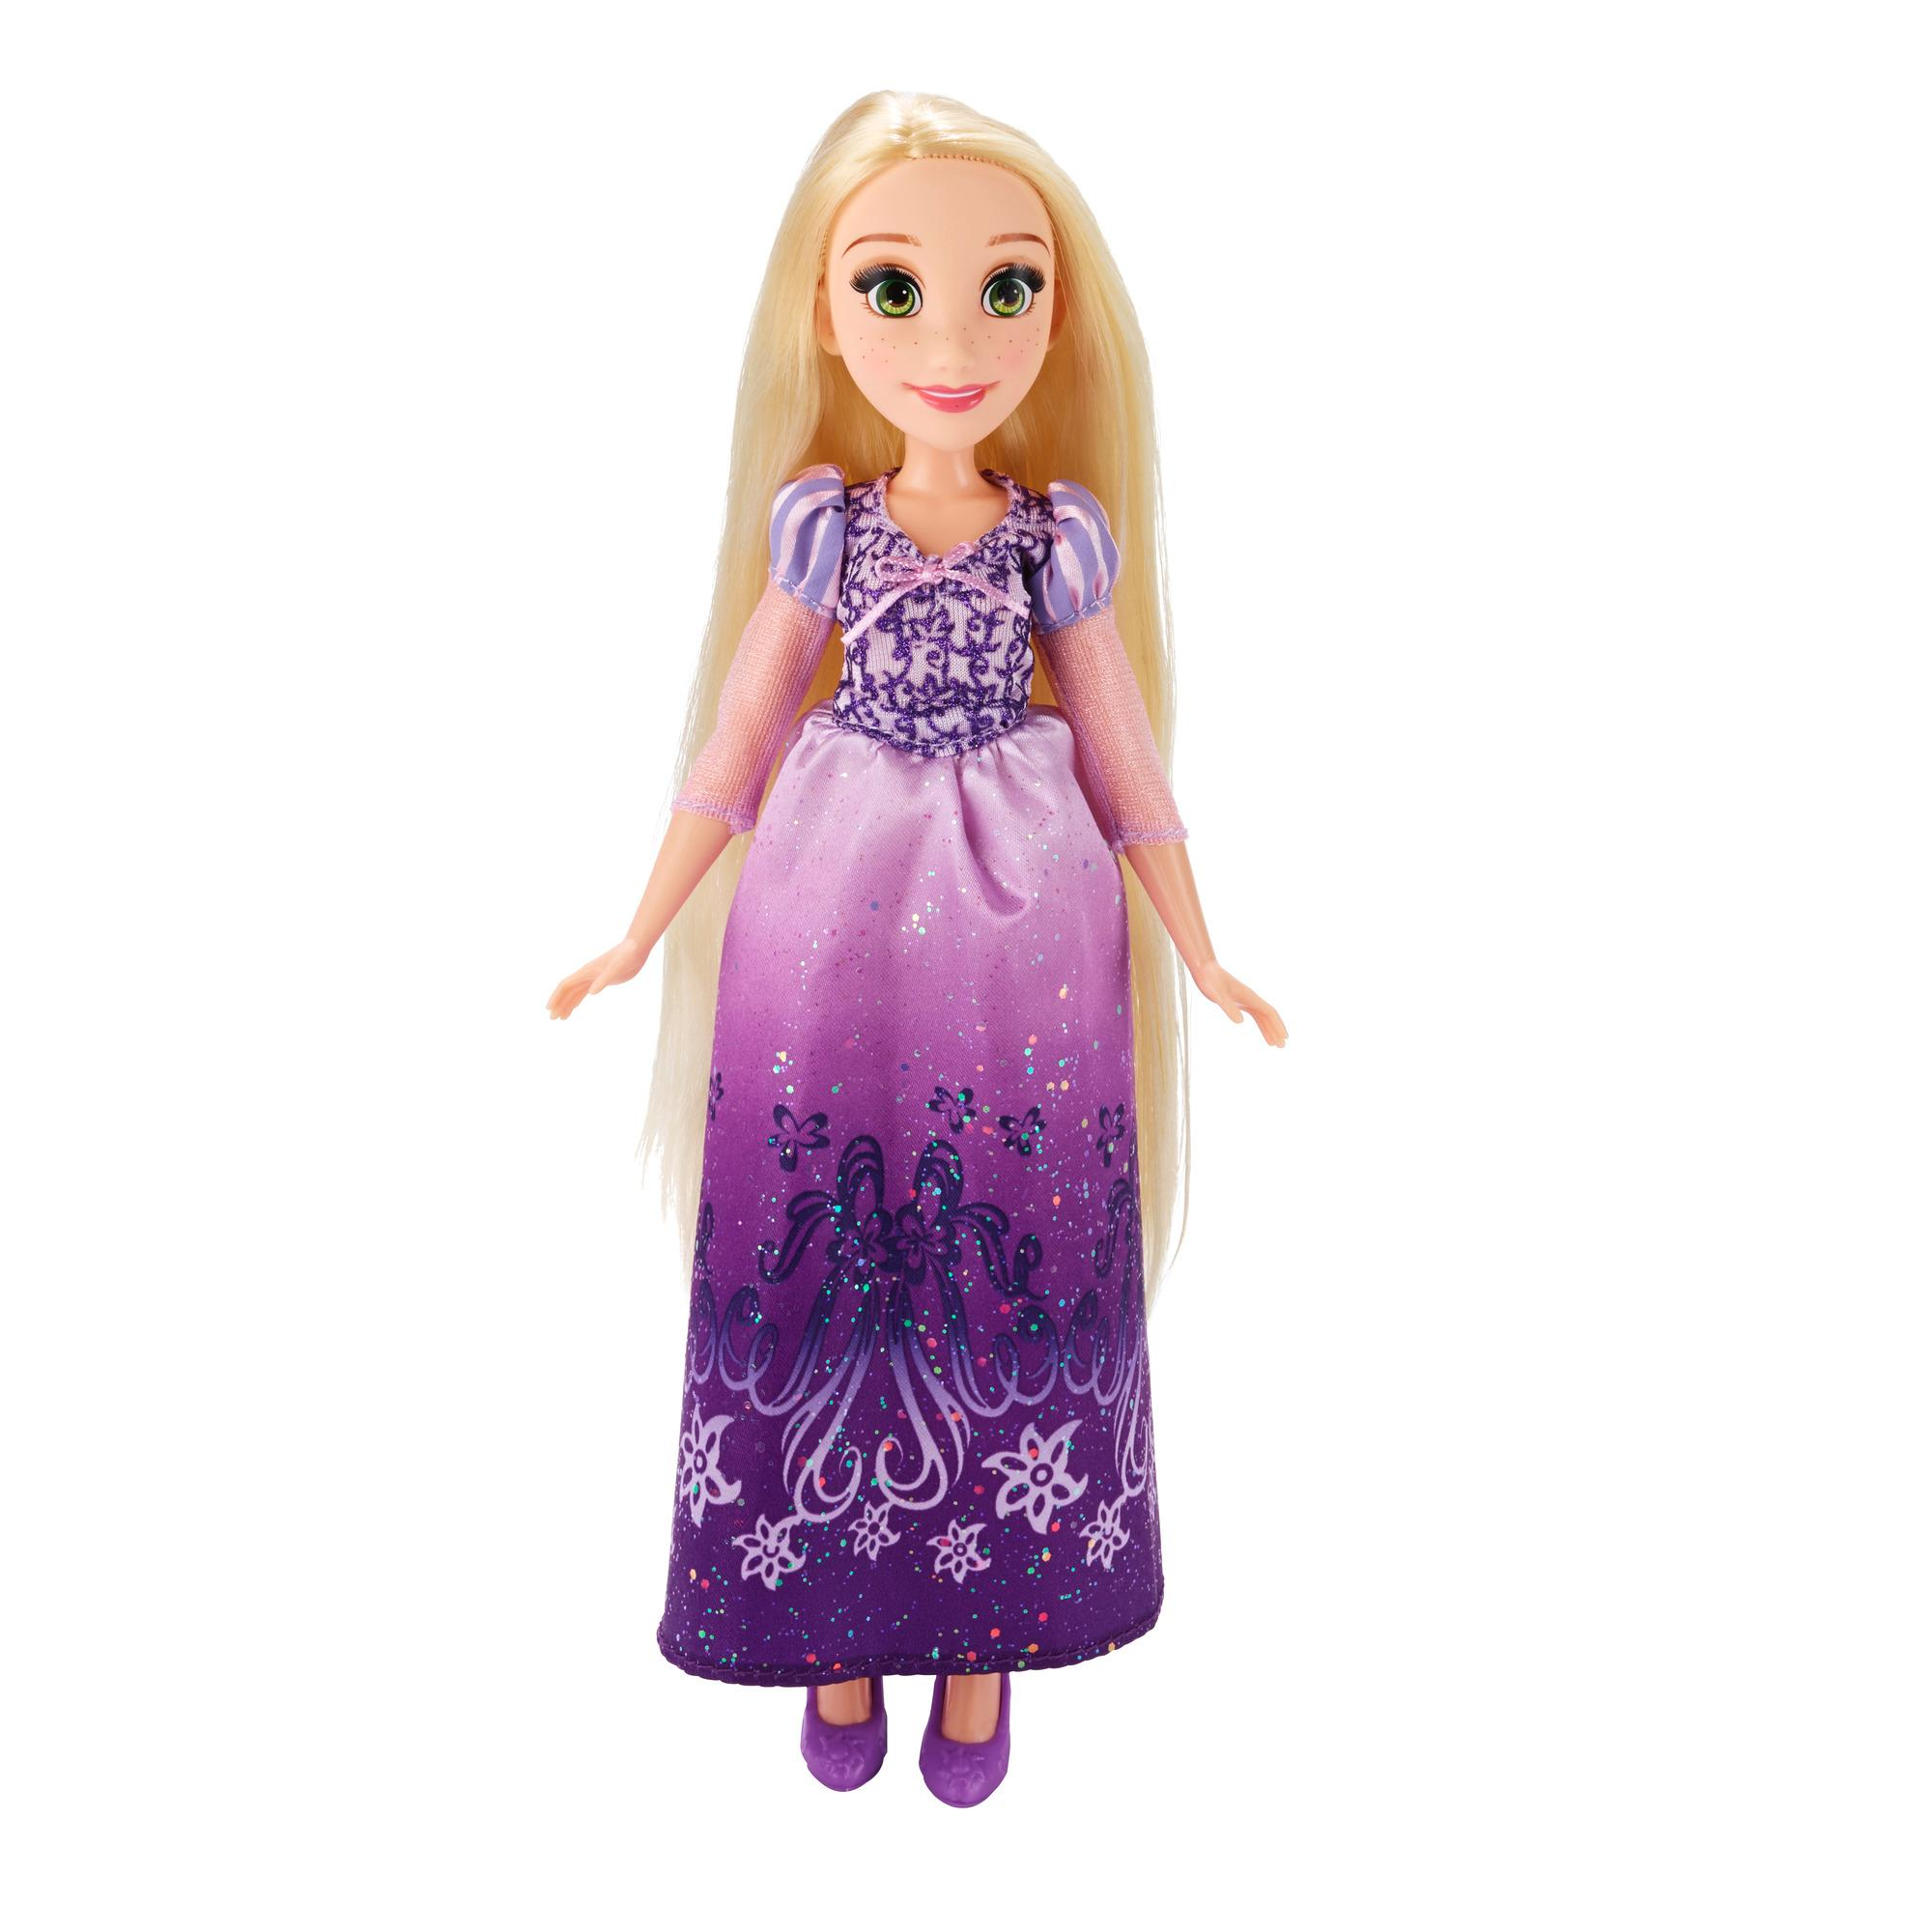 Muñeca de Rapunzel Royal Shimmer Disney Princess